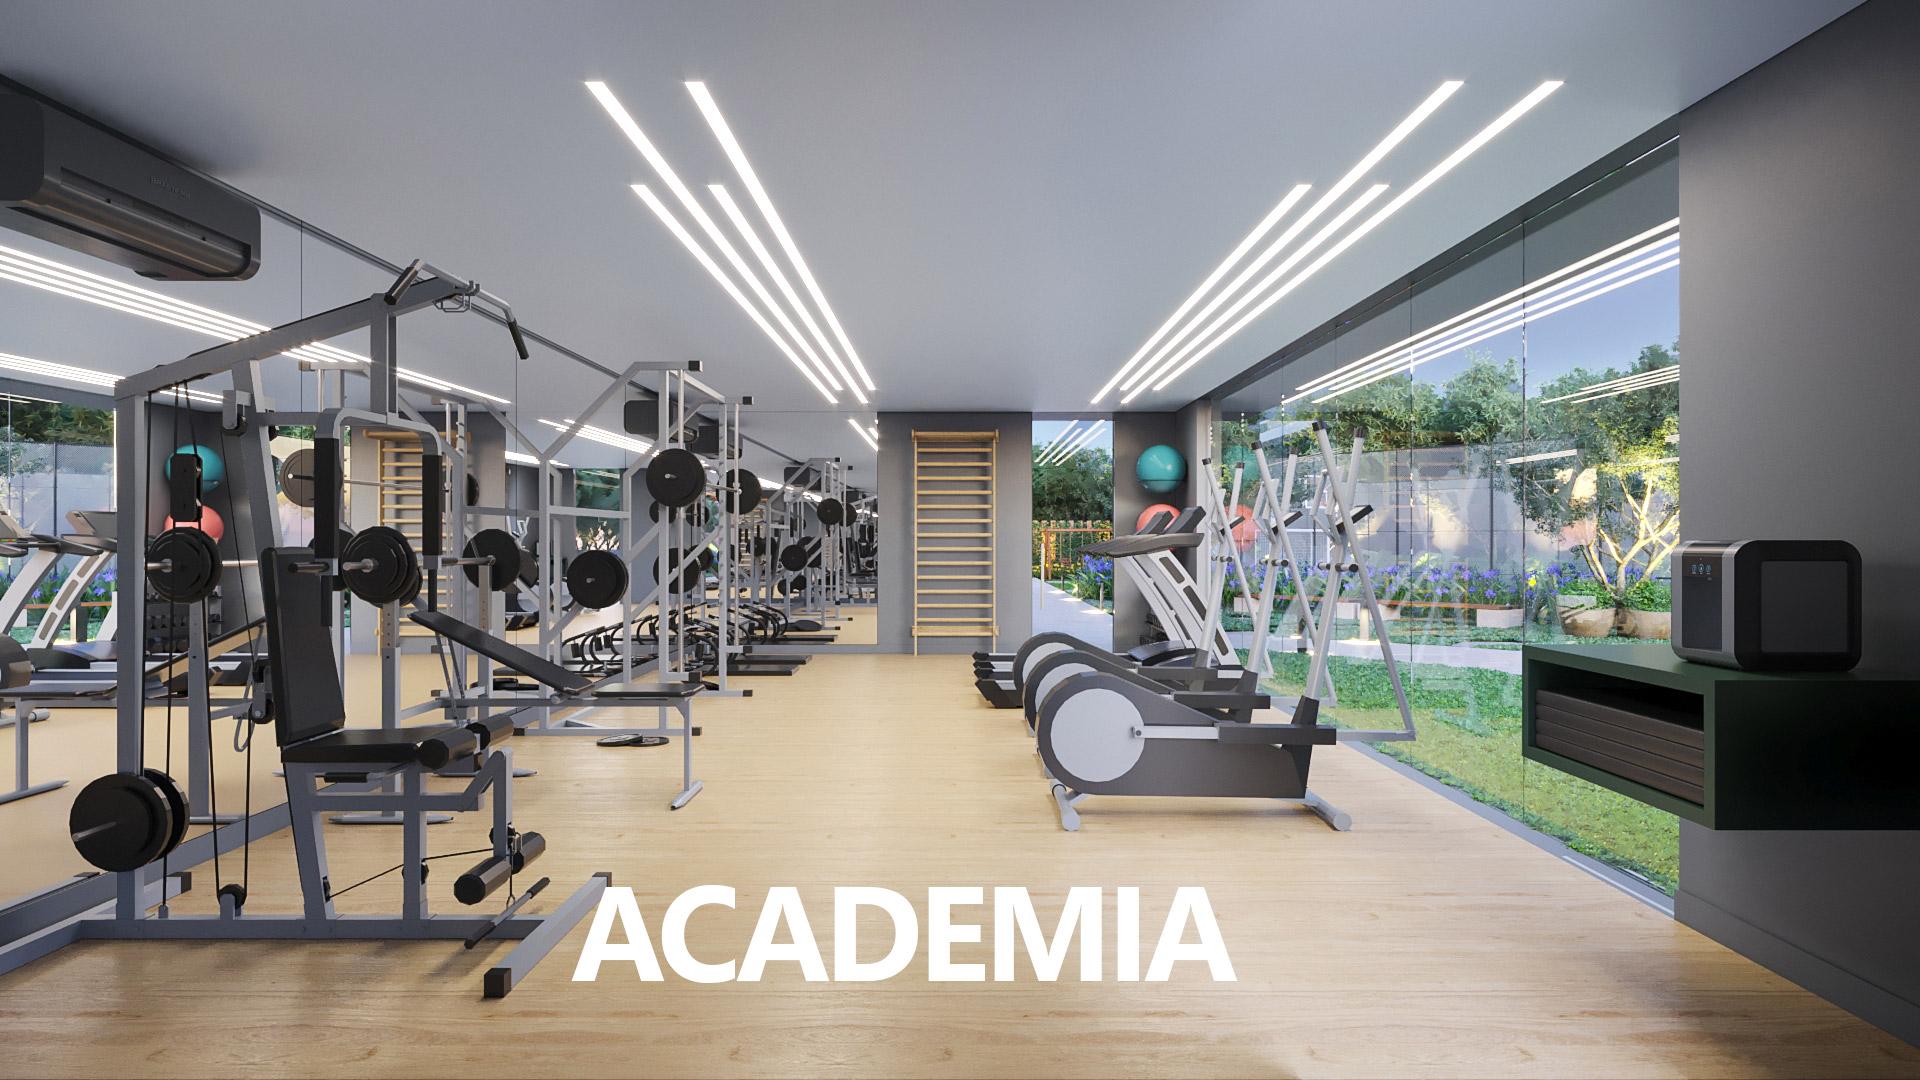 ACADEMIA-APARTAMENTO-NO-BAIRRO-GLORIA-JOINVILLE-BOSQUES-DE-PALERMO-HOME-CLUB